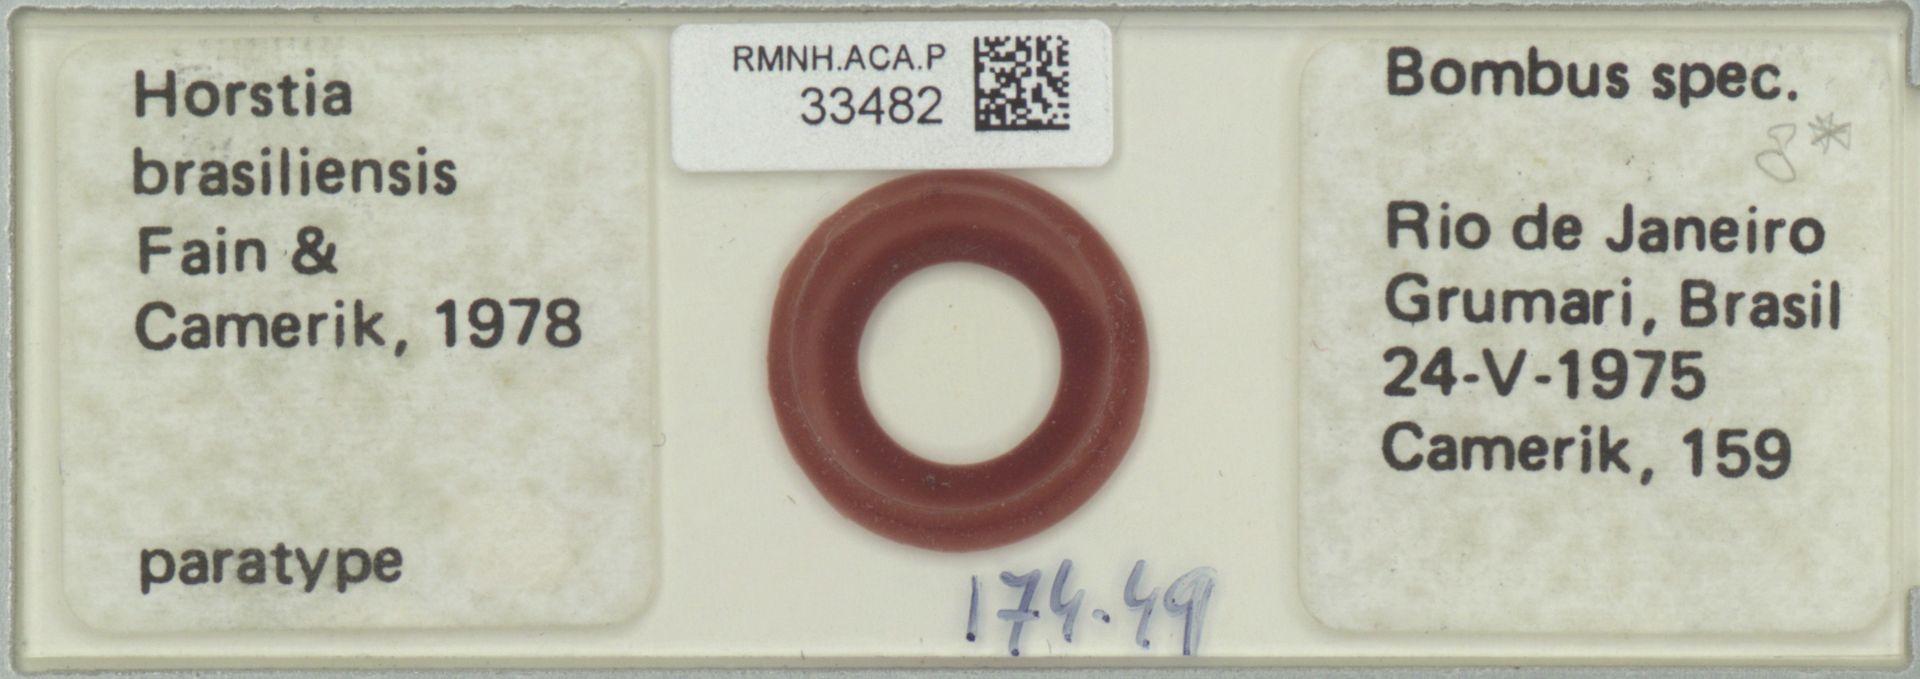 RMNH.ACA.P.33482 | Horstia brasiliensis Fain & Camerik 1978